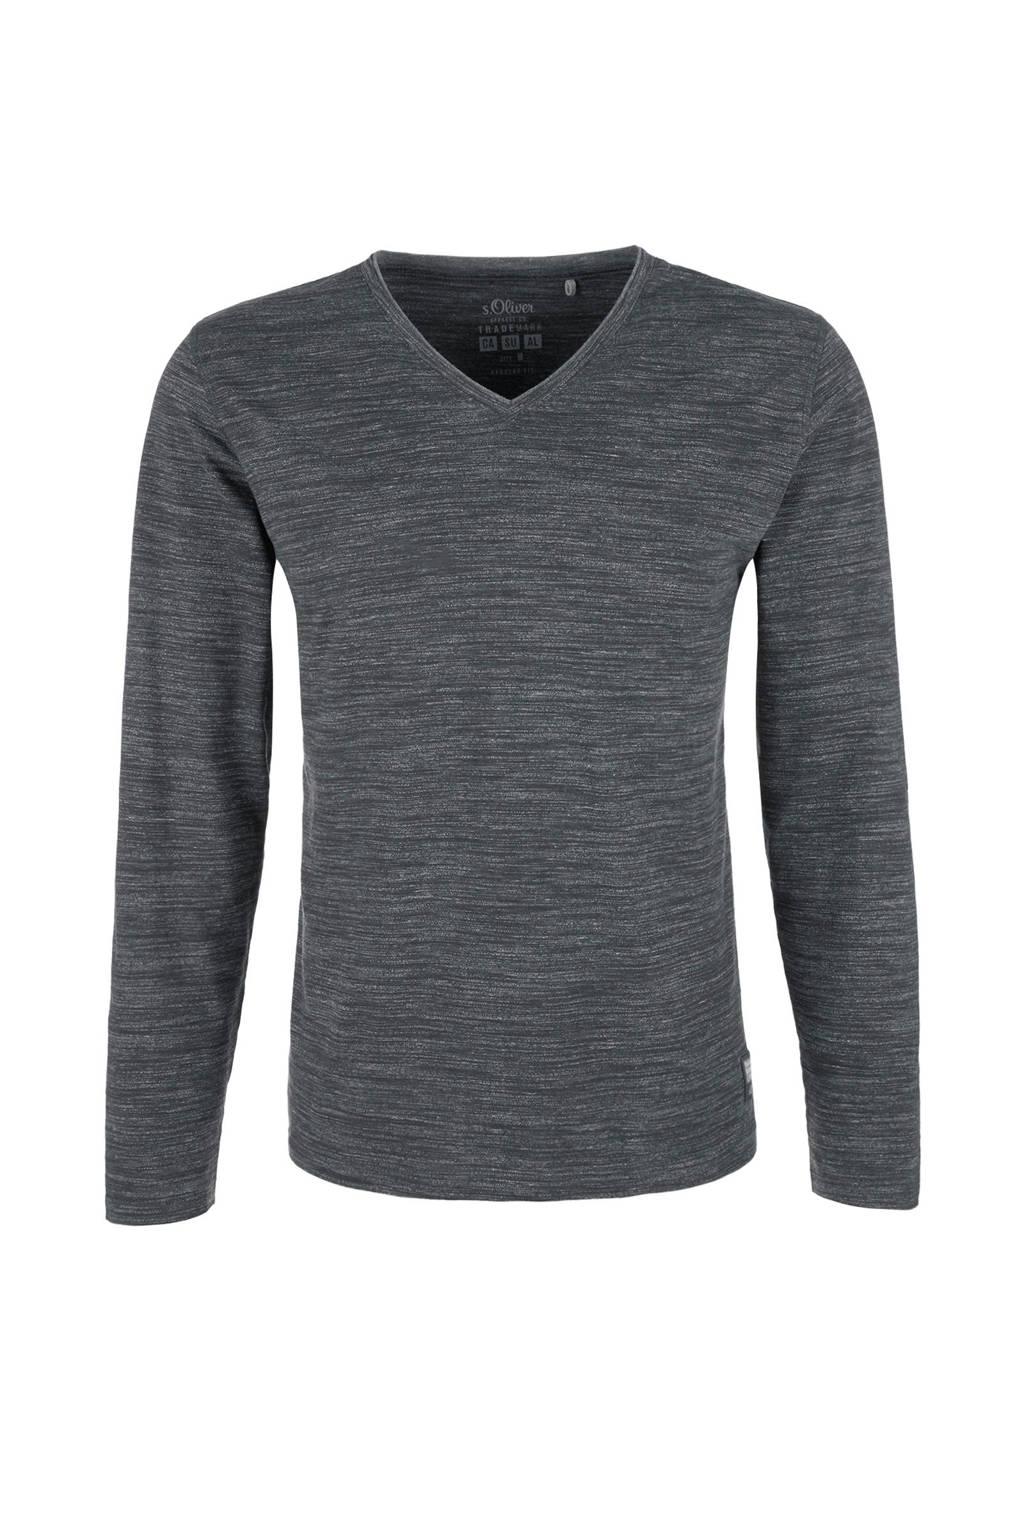 s.Oliver T-shirt, Antraciet